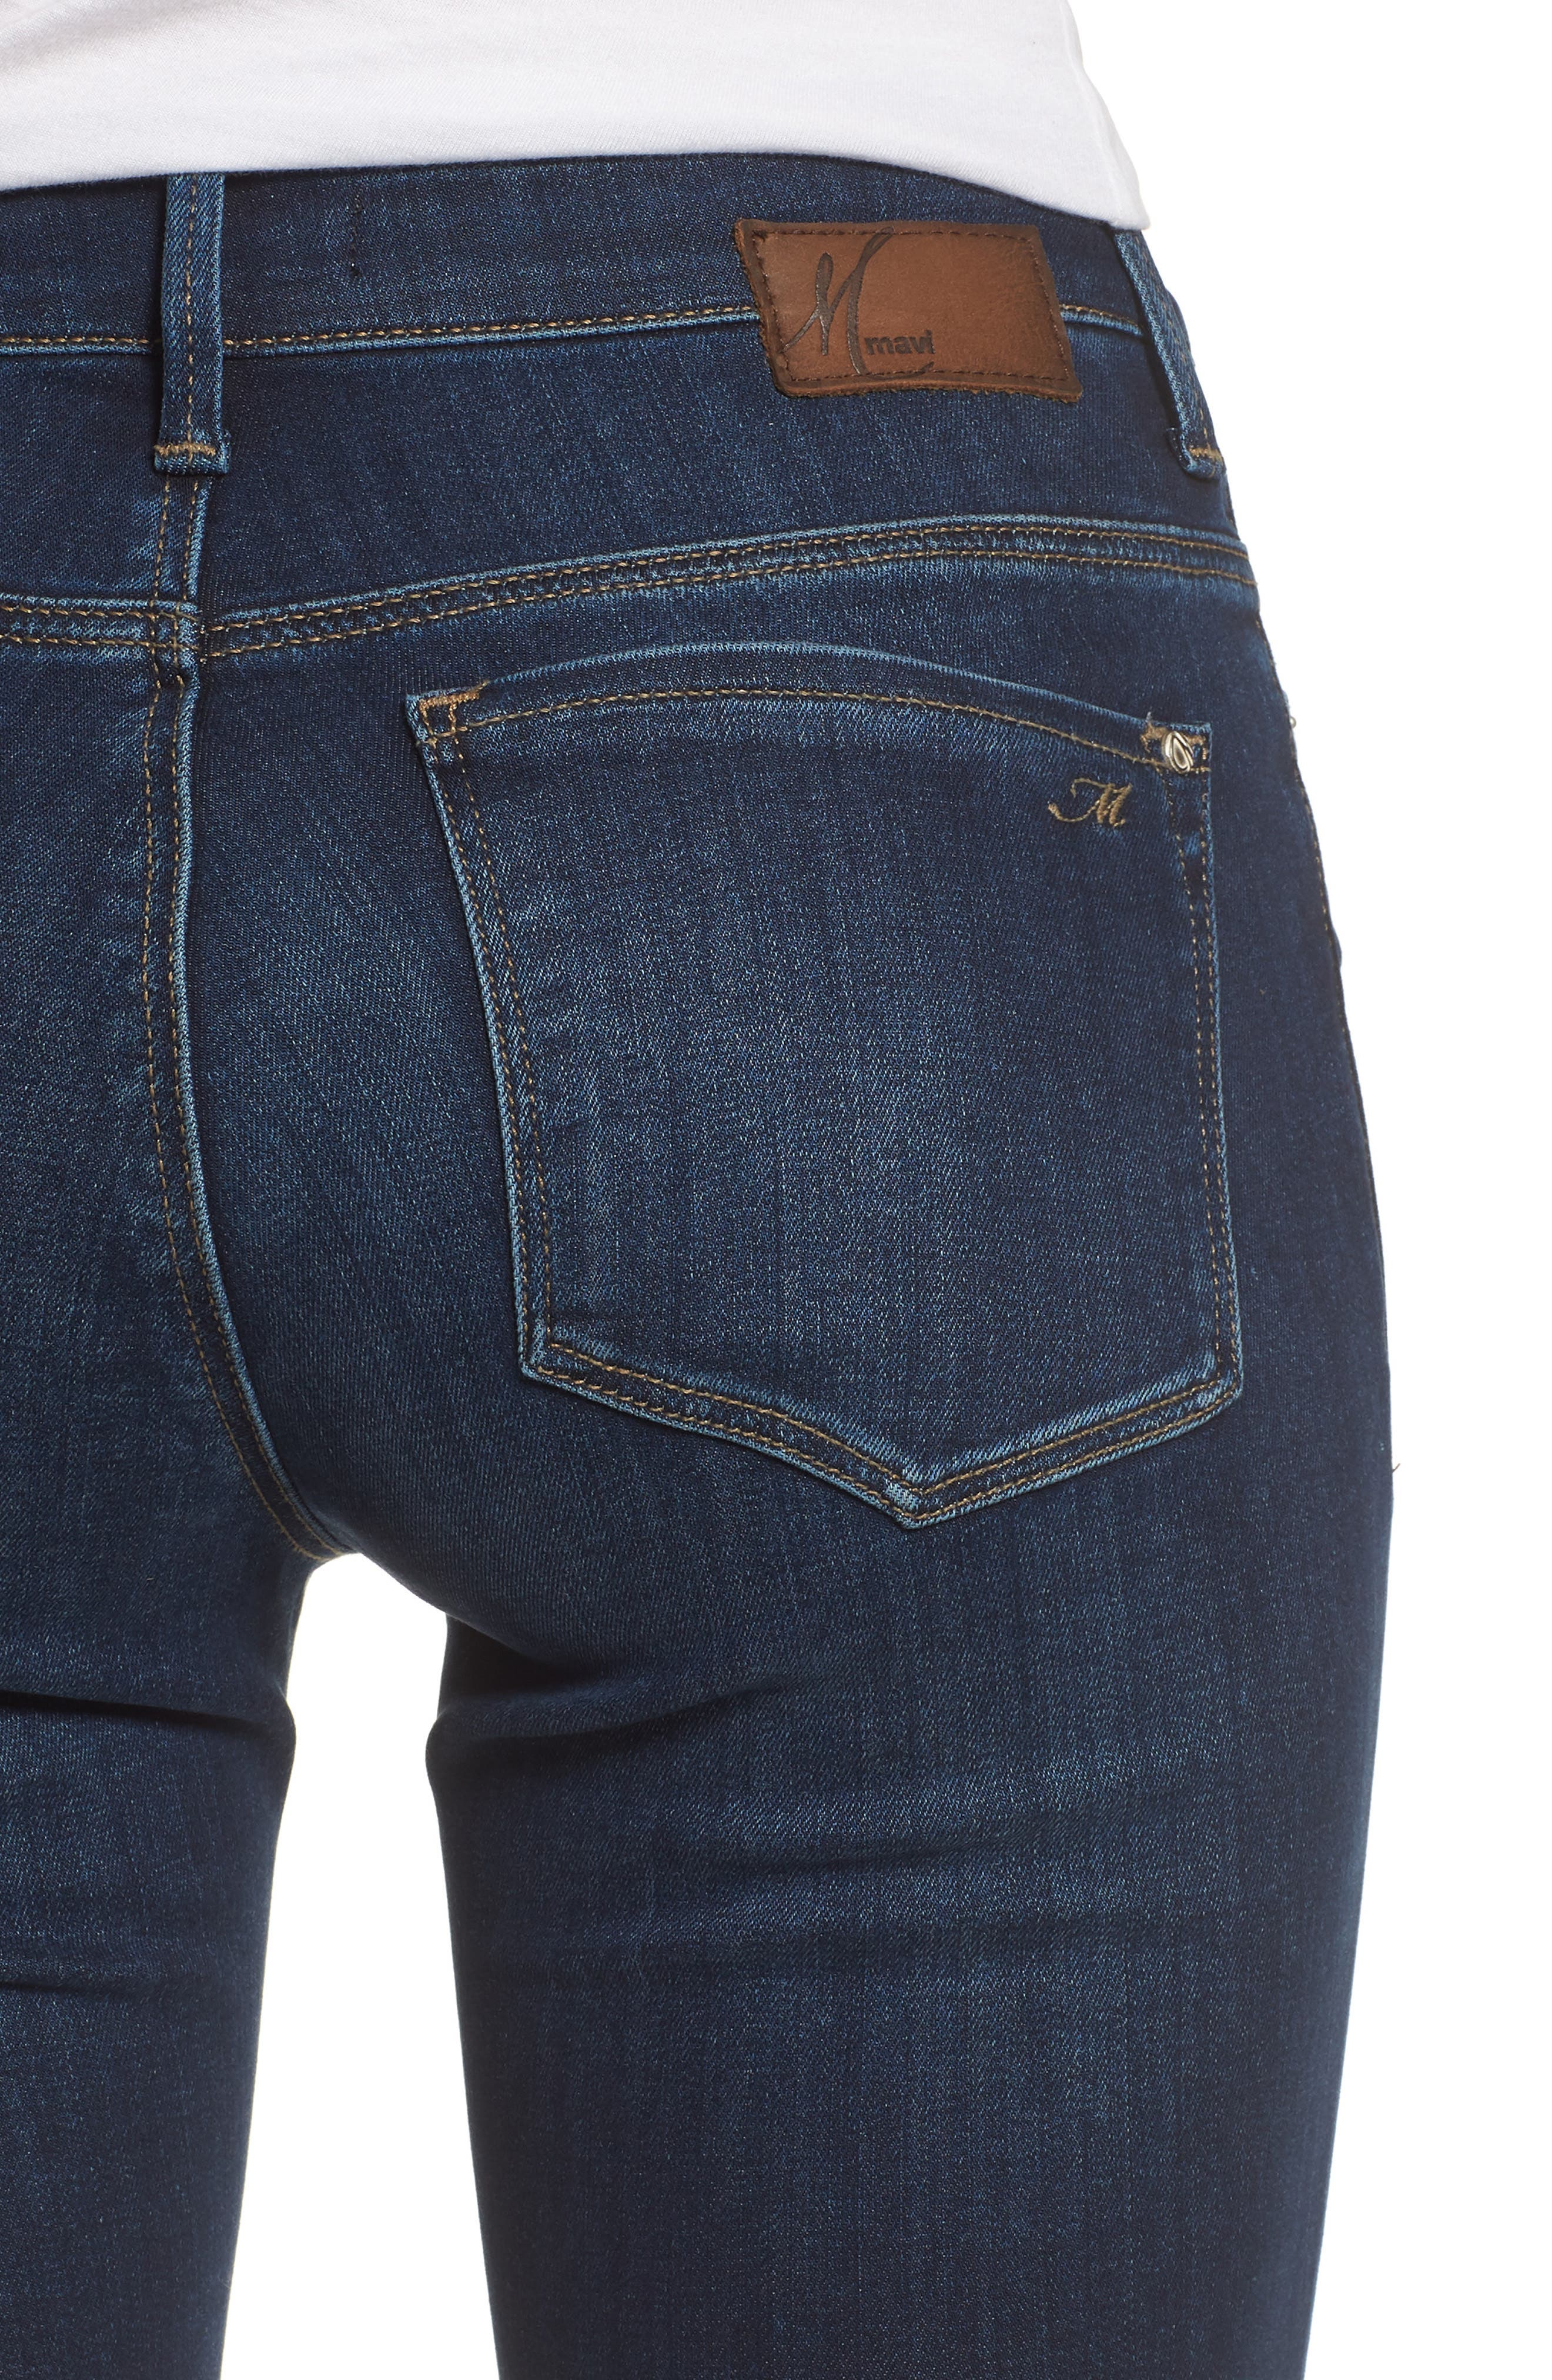 Alissa Skinny Jeans,                             Alternate thumbnail 4, color,                             Dark Supersoft